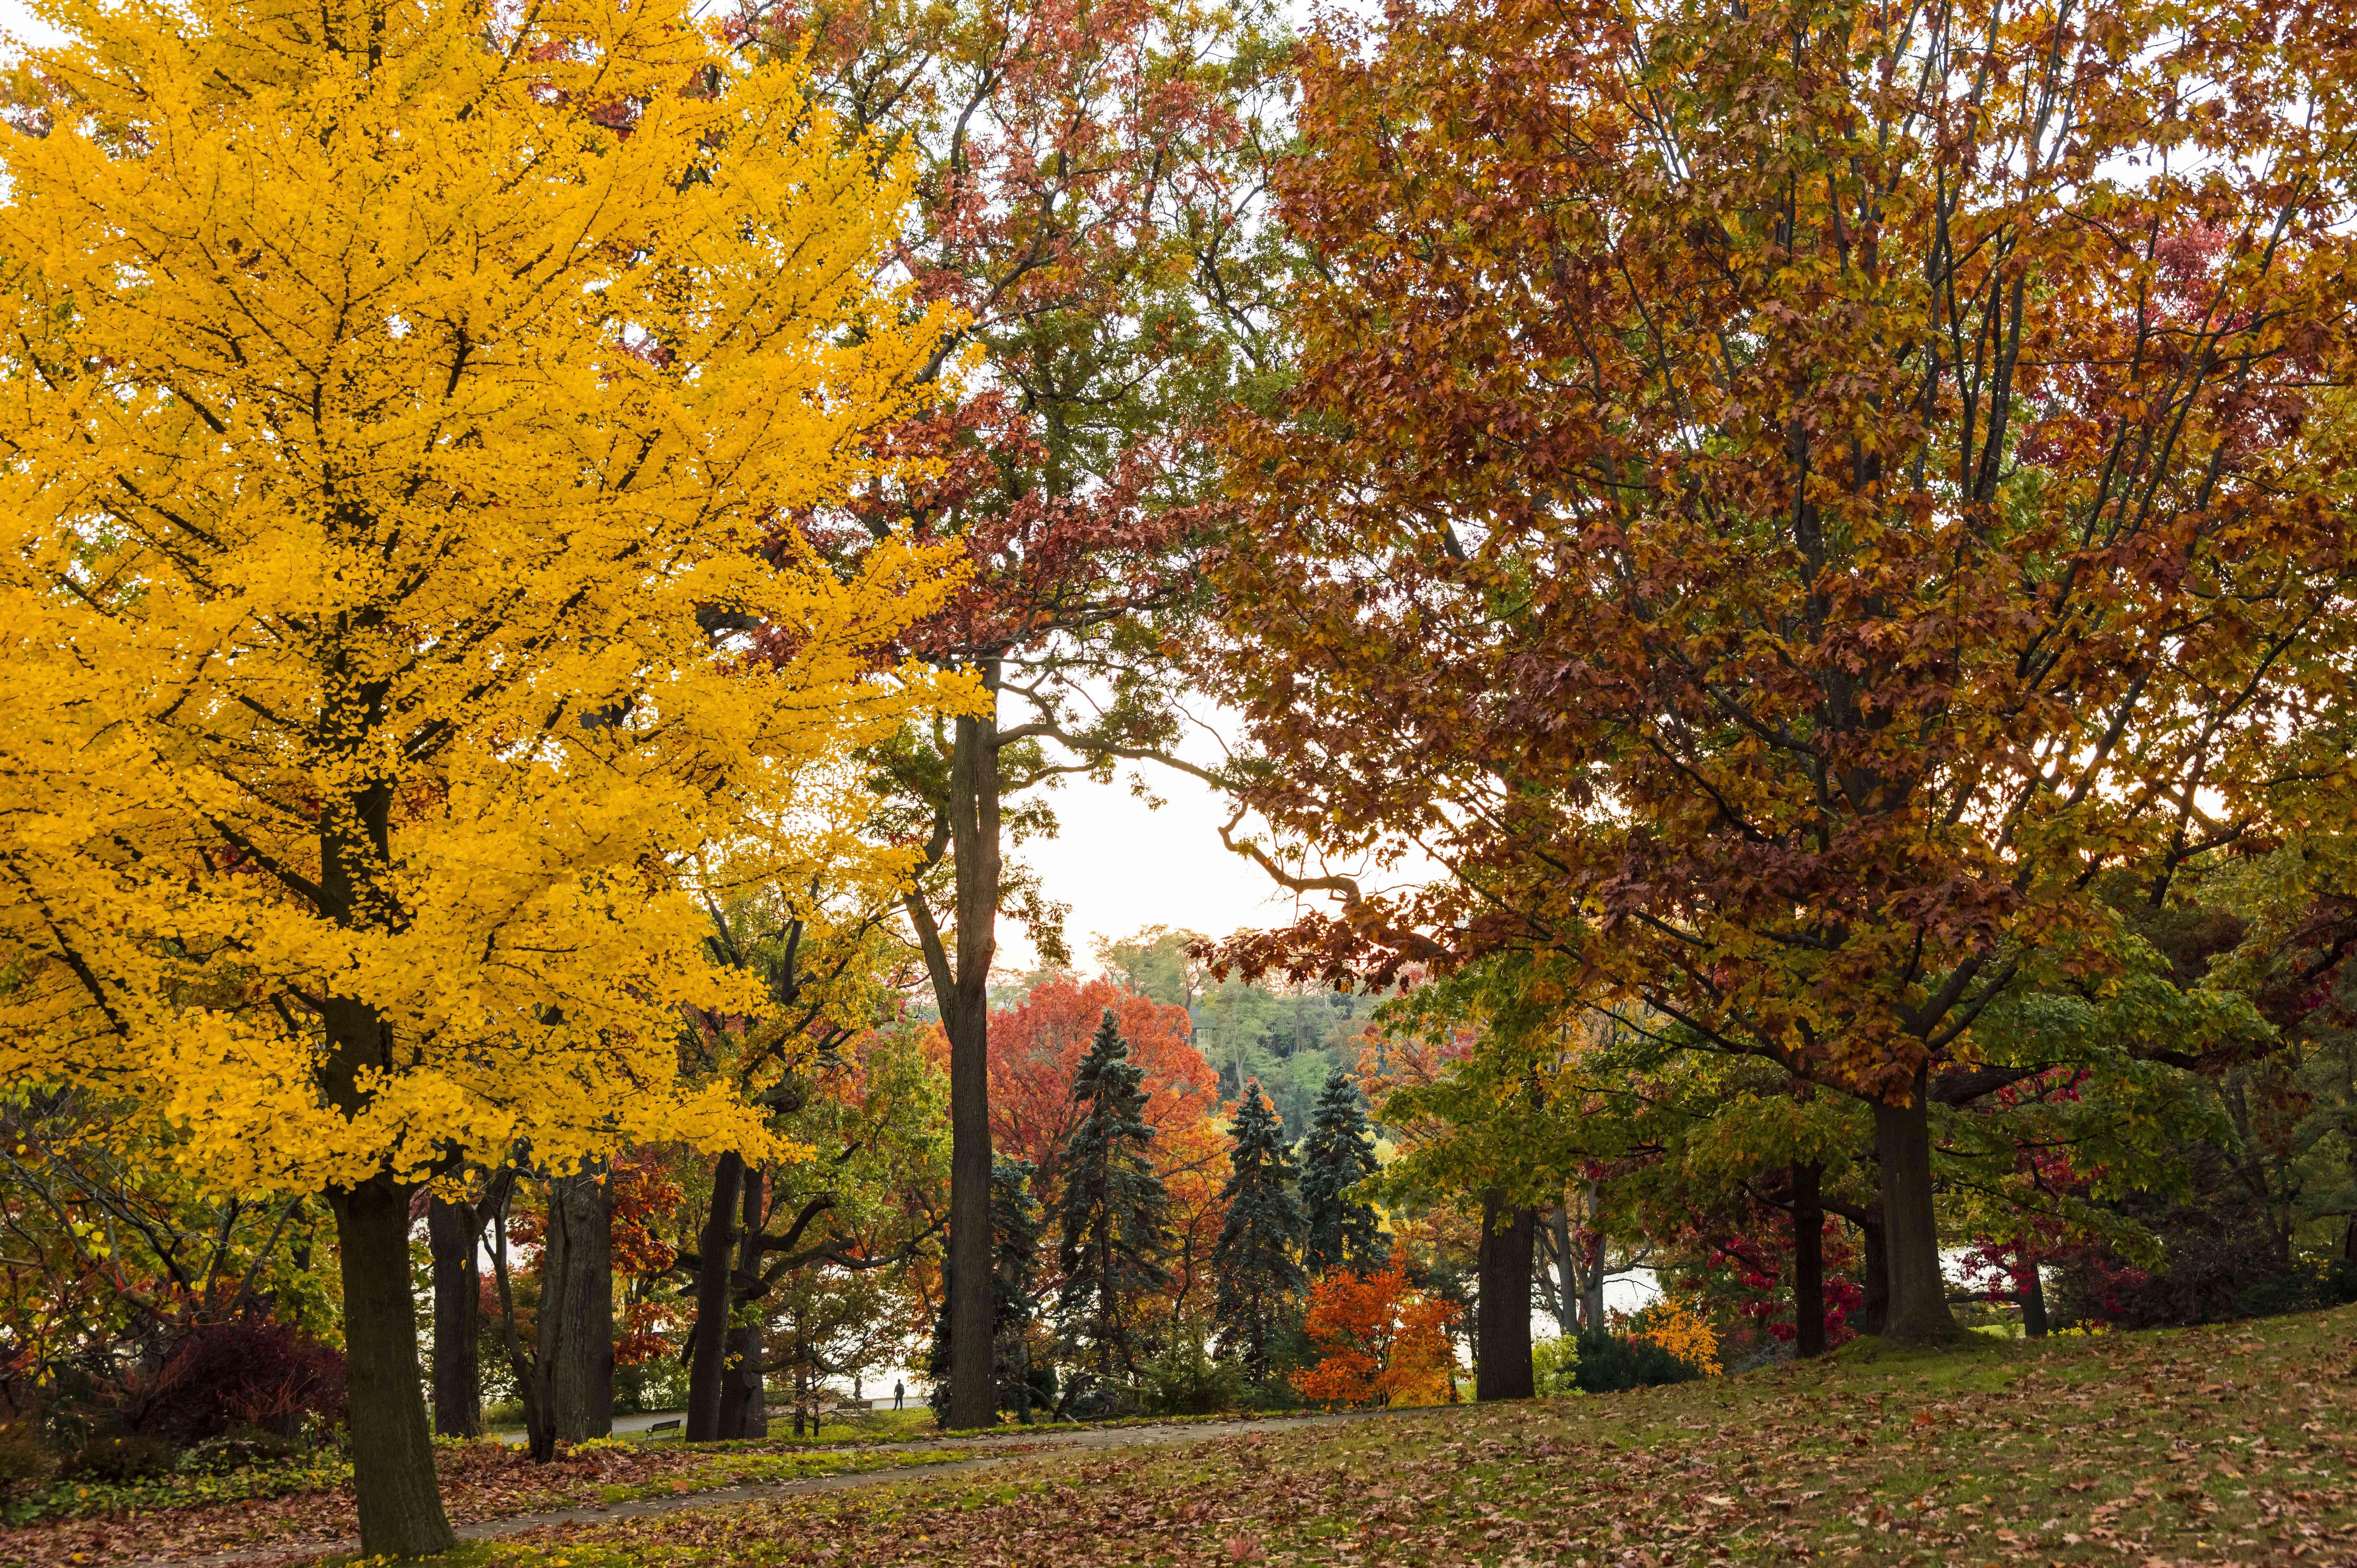 Fall foliage in High Park,Toronto